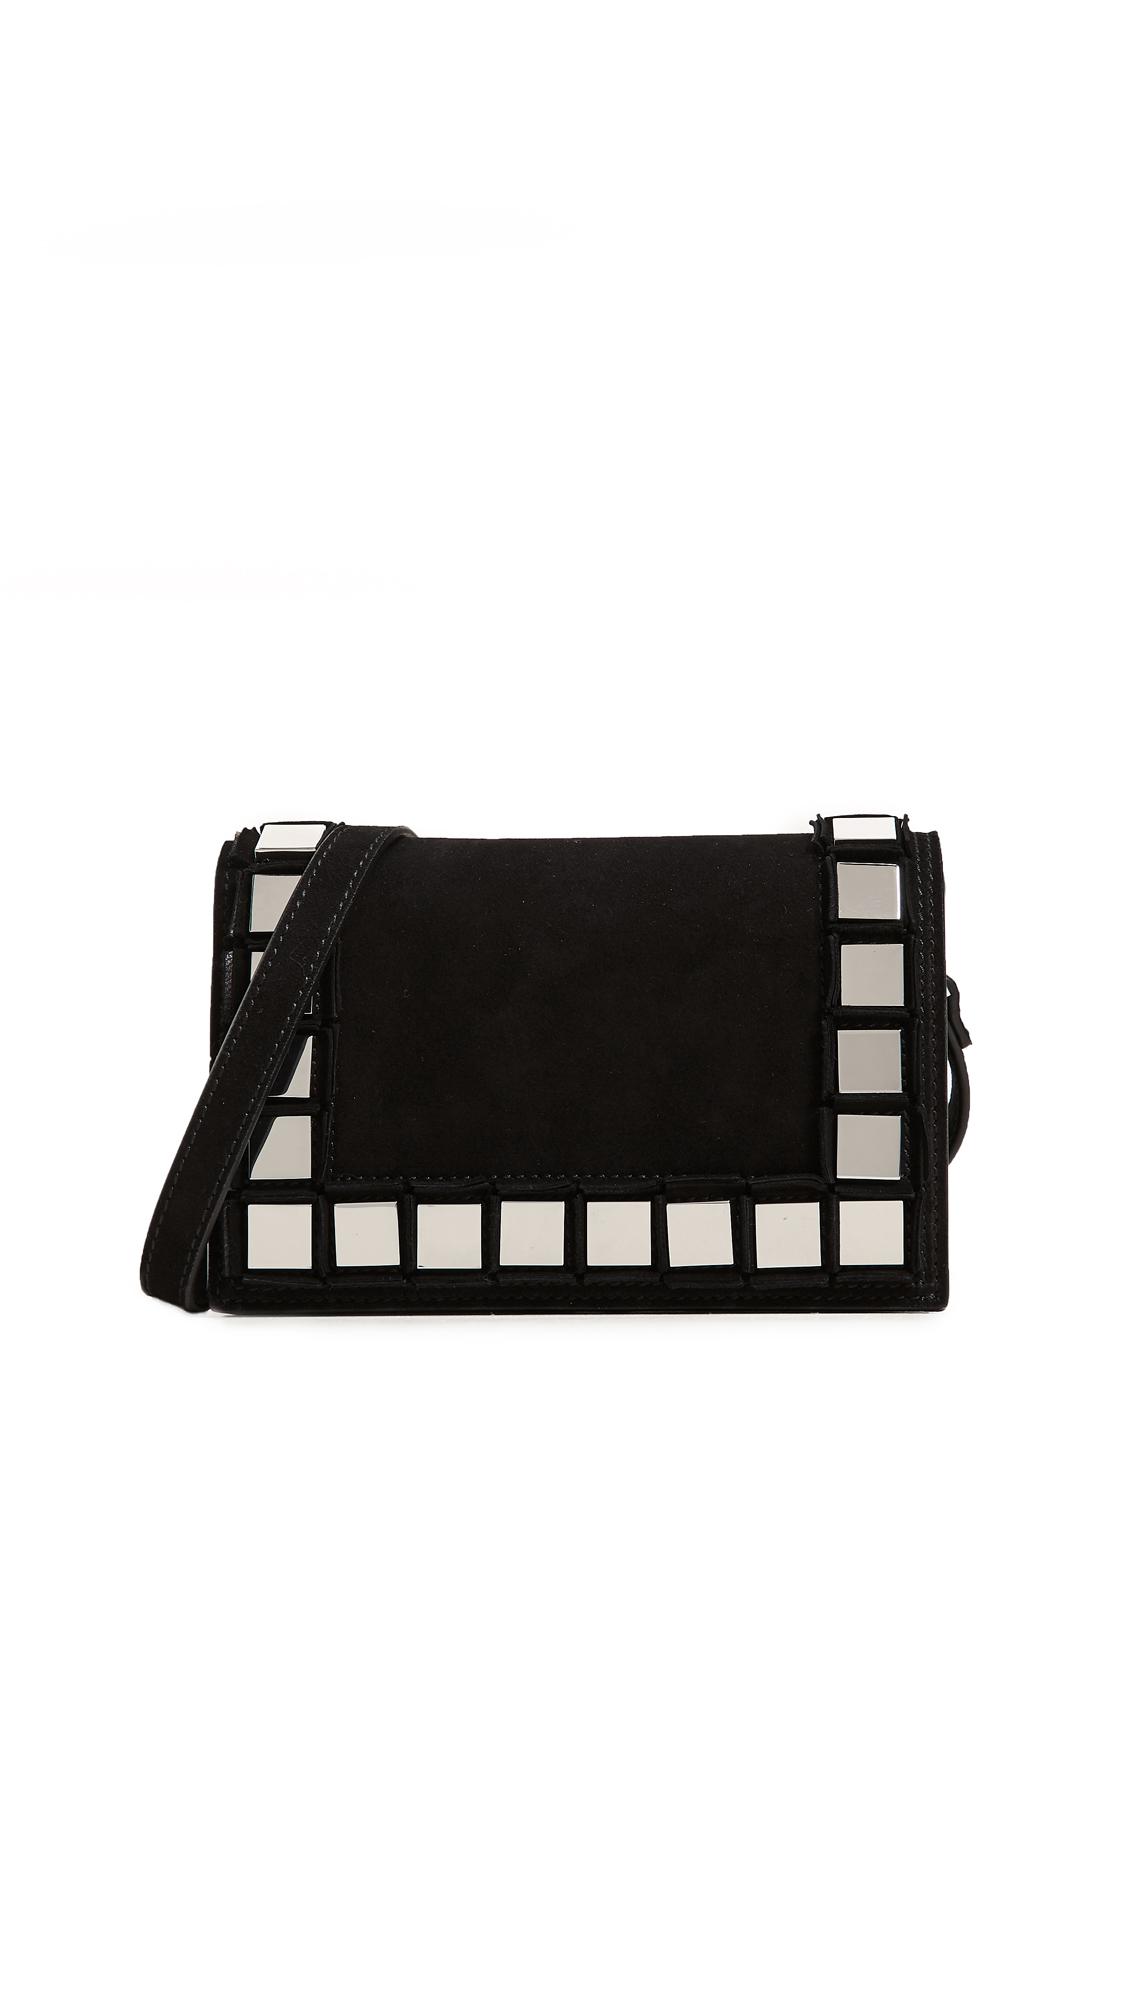 TOMASINI Anja Cross Body Bag